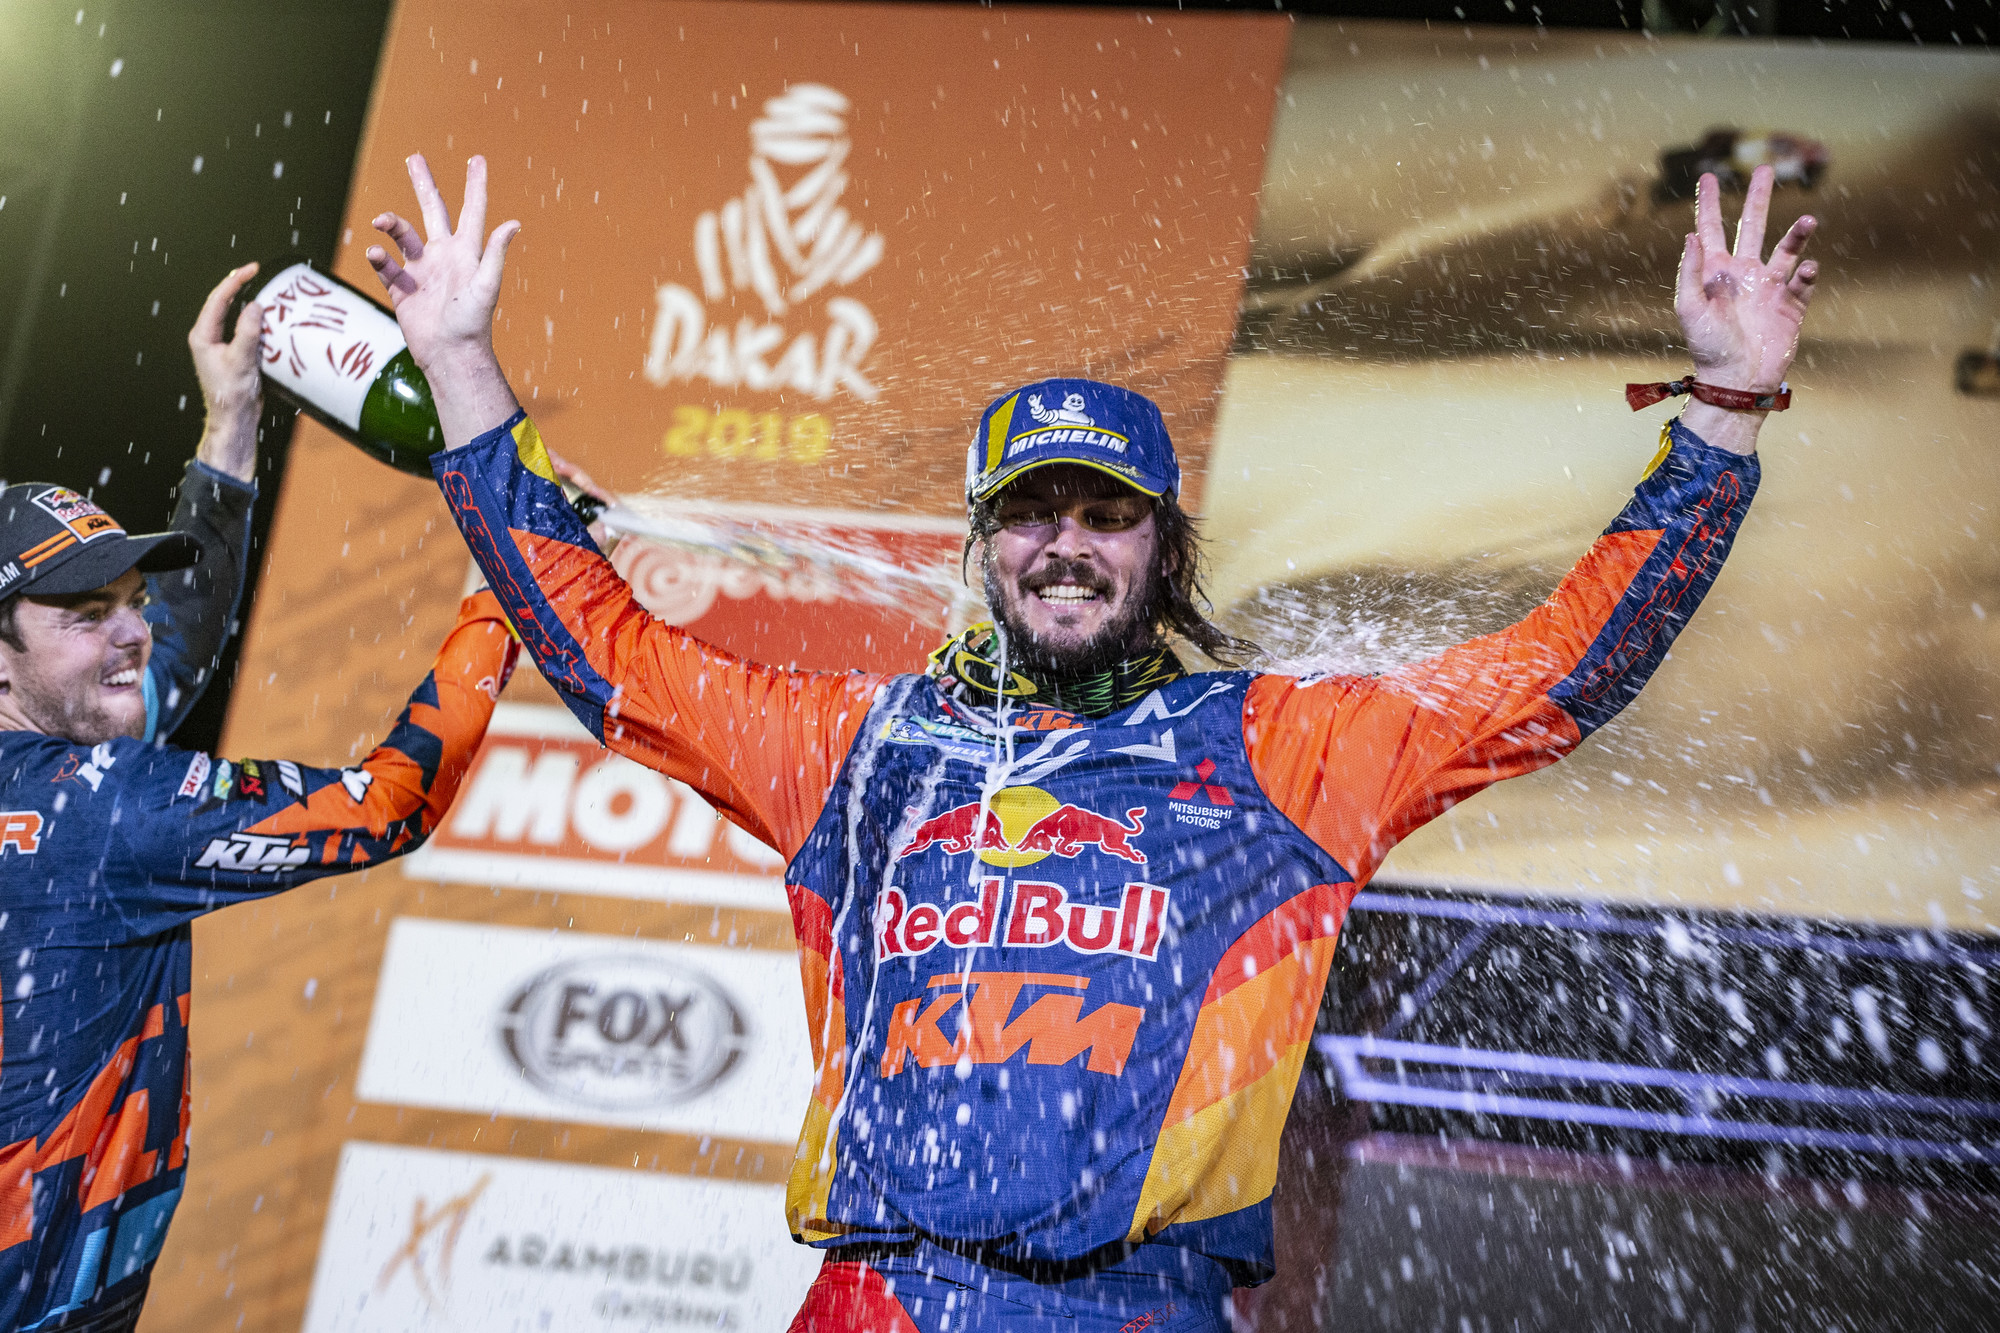 263427_toby.price_finish_Red Bull KTM Factory Racing_Dakar2019_504.jpg